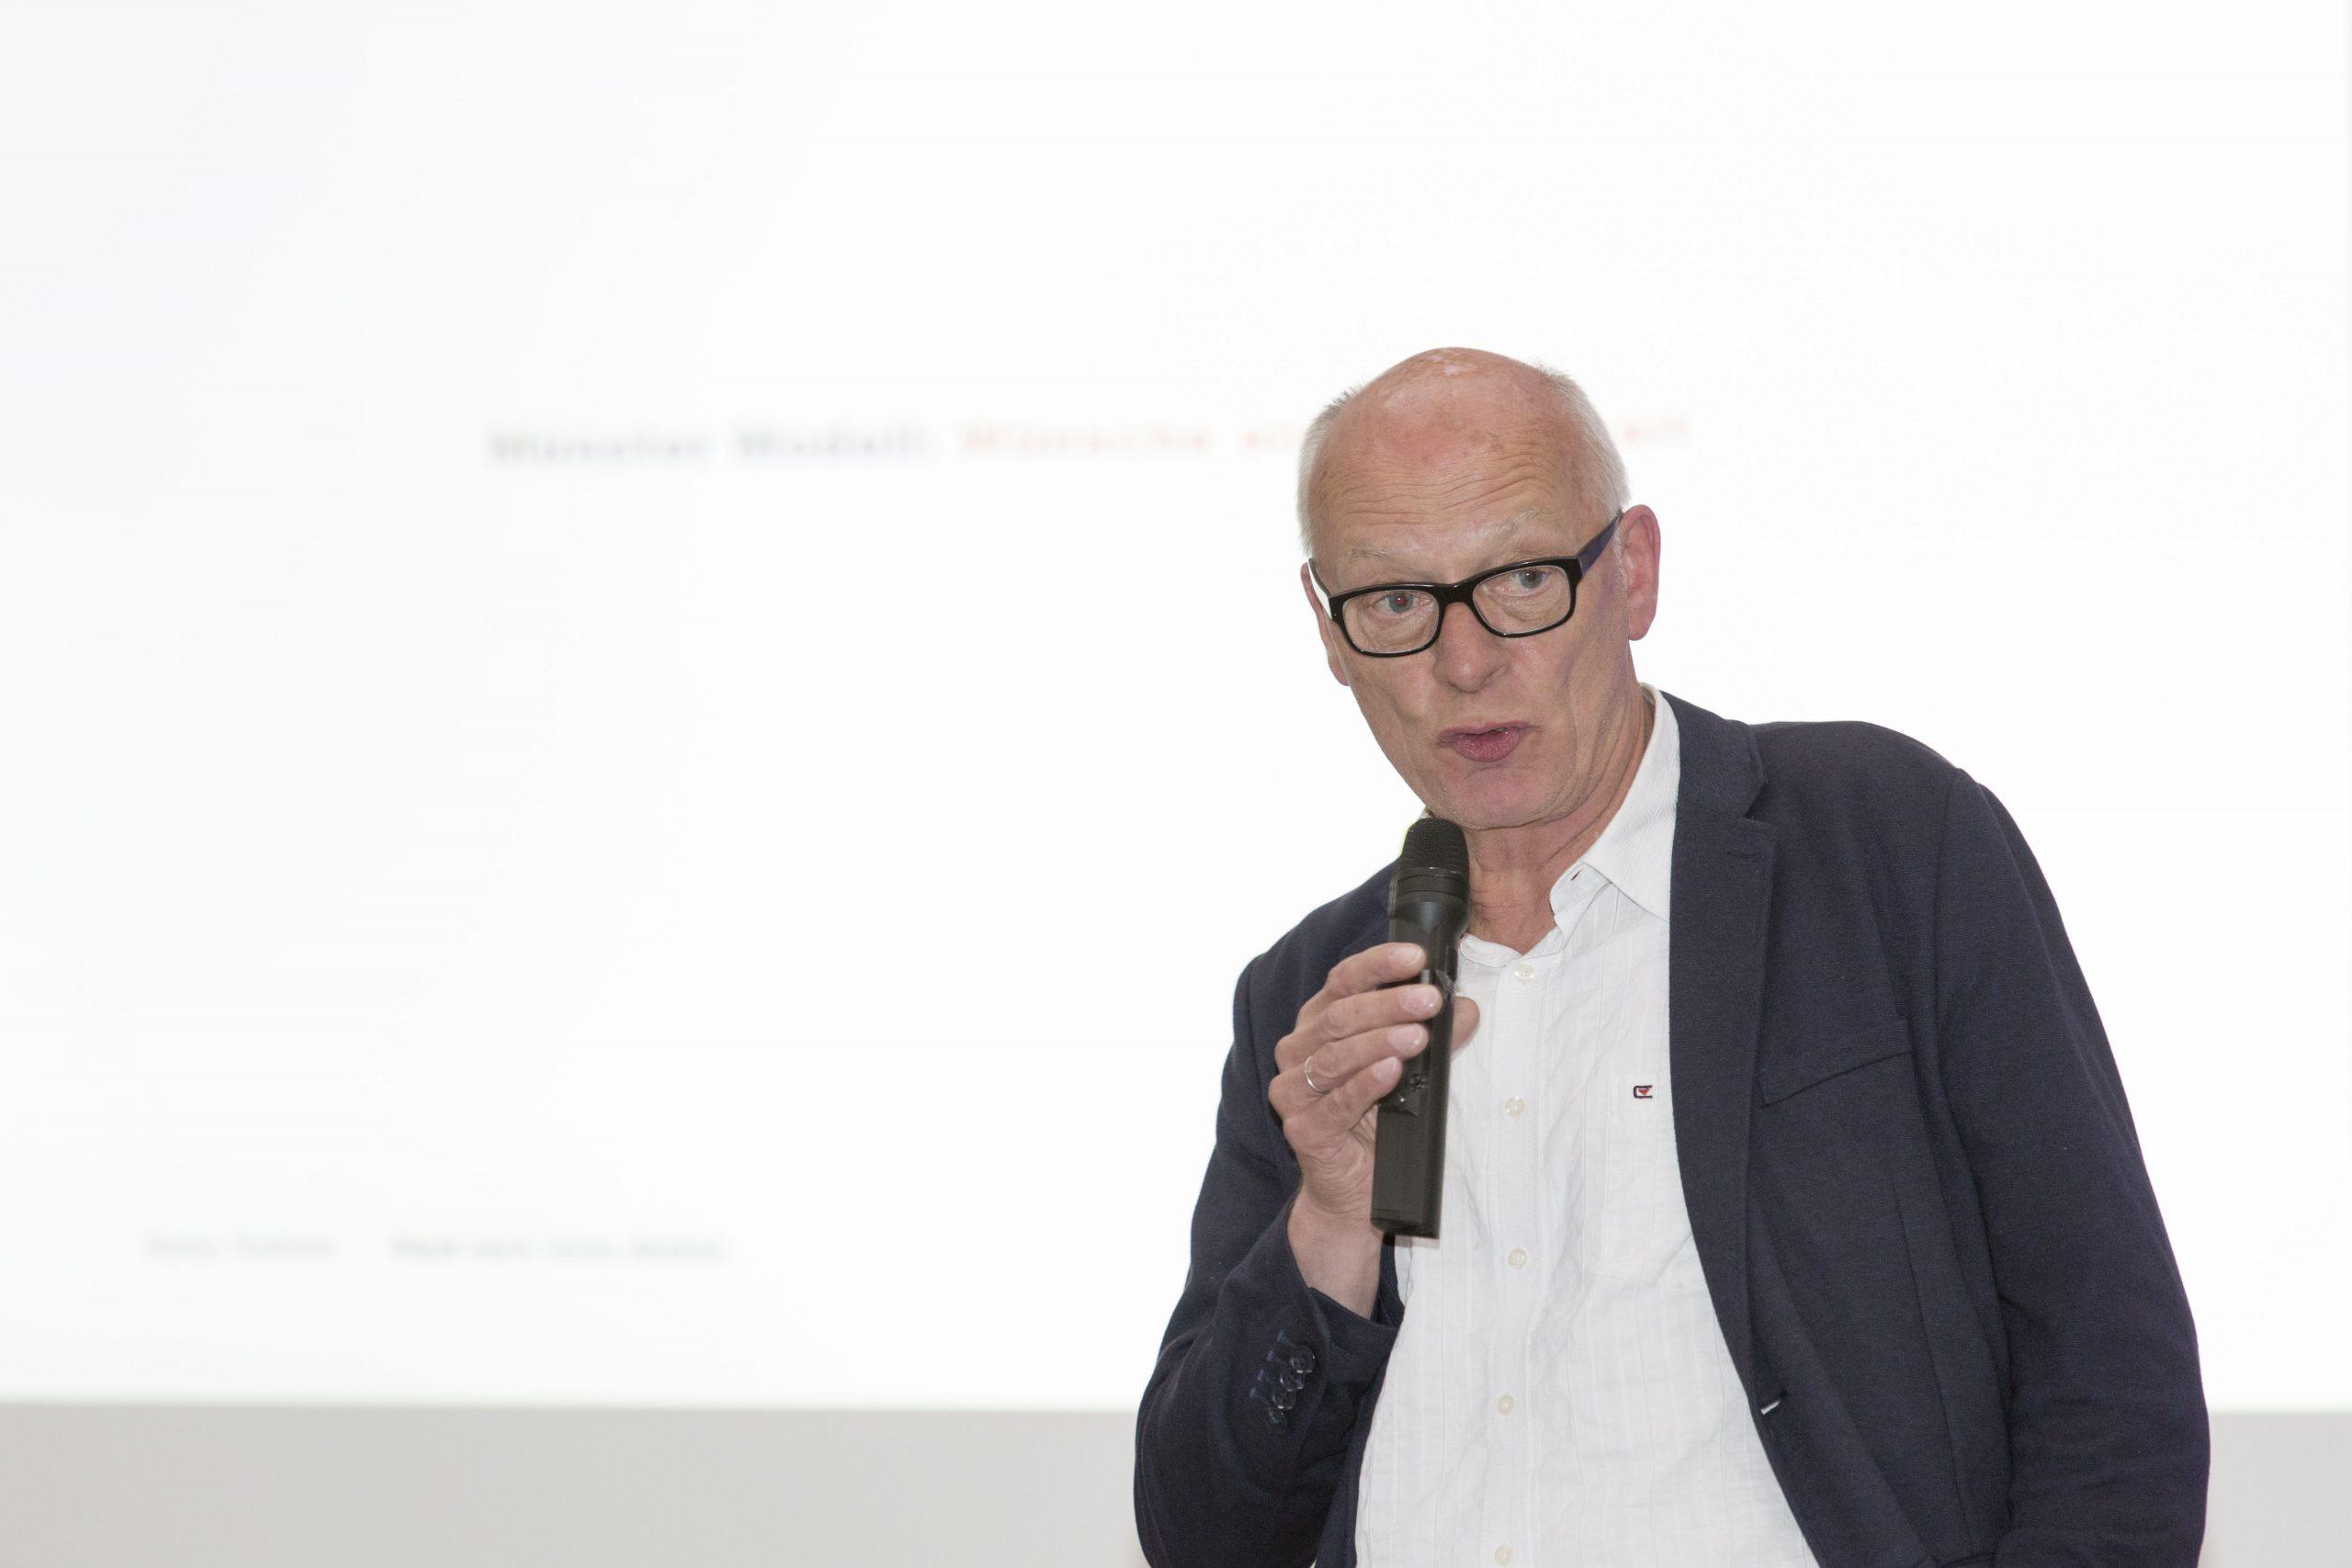 Münster Modell: Jubiläum 2016 - Foto: Roland Borgmann